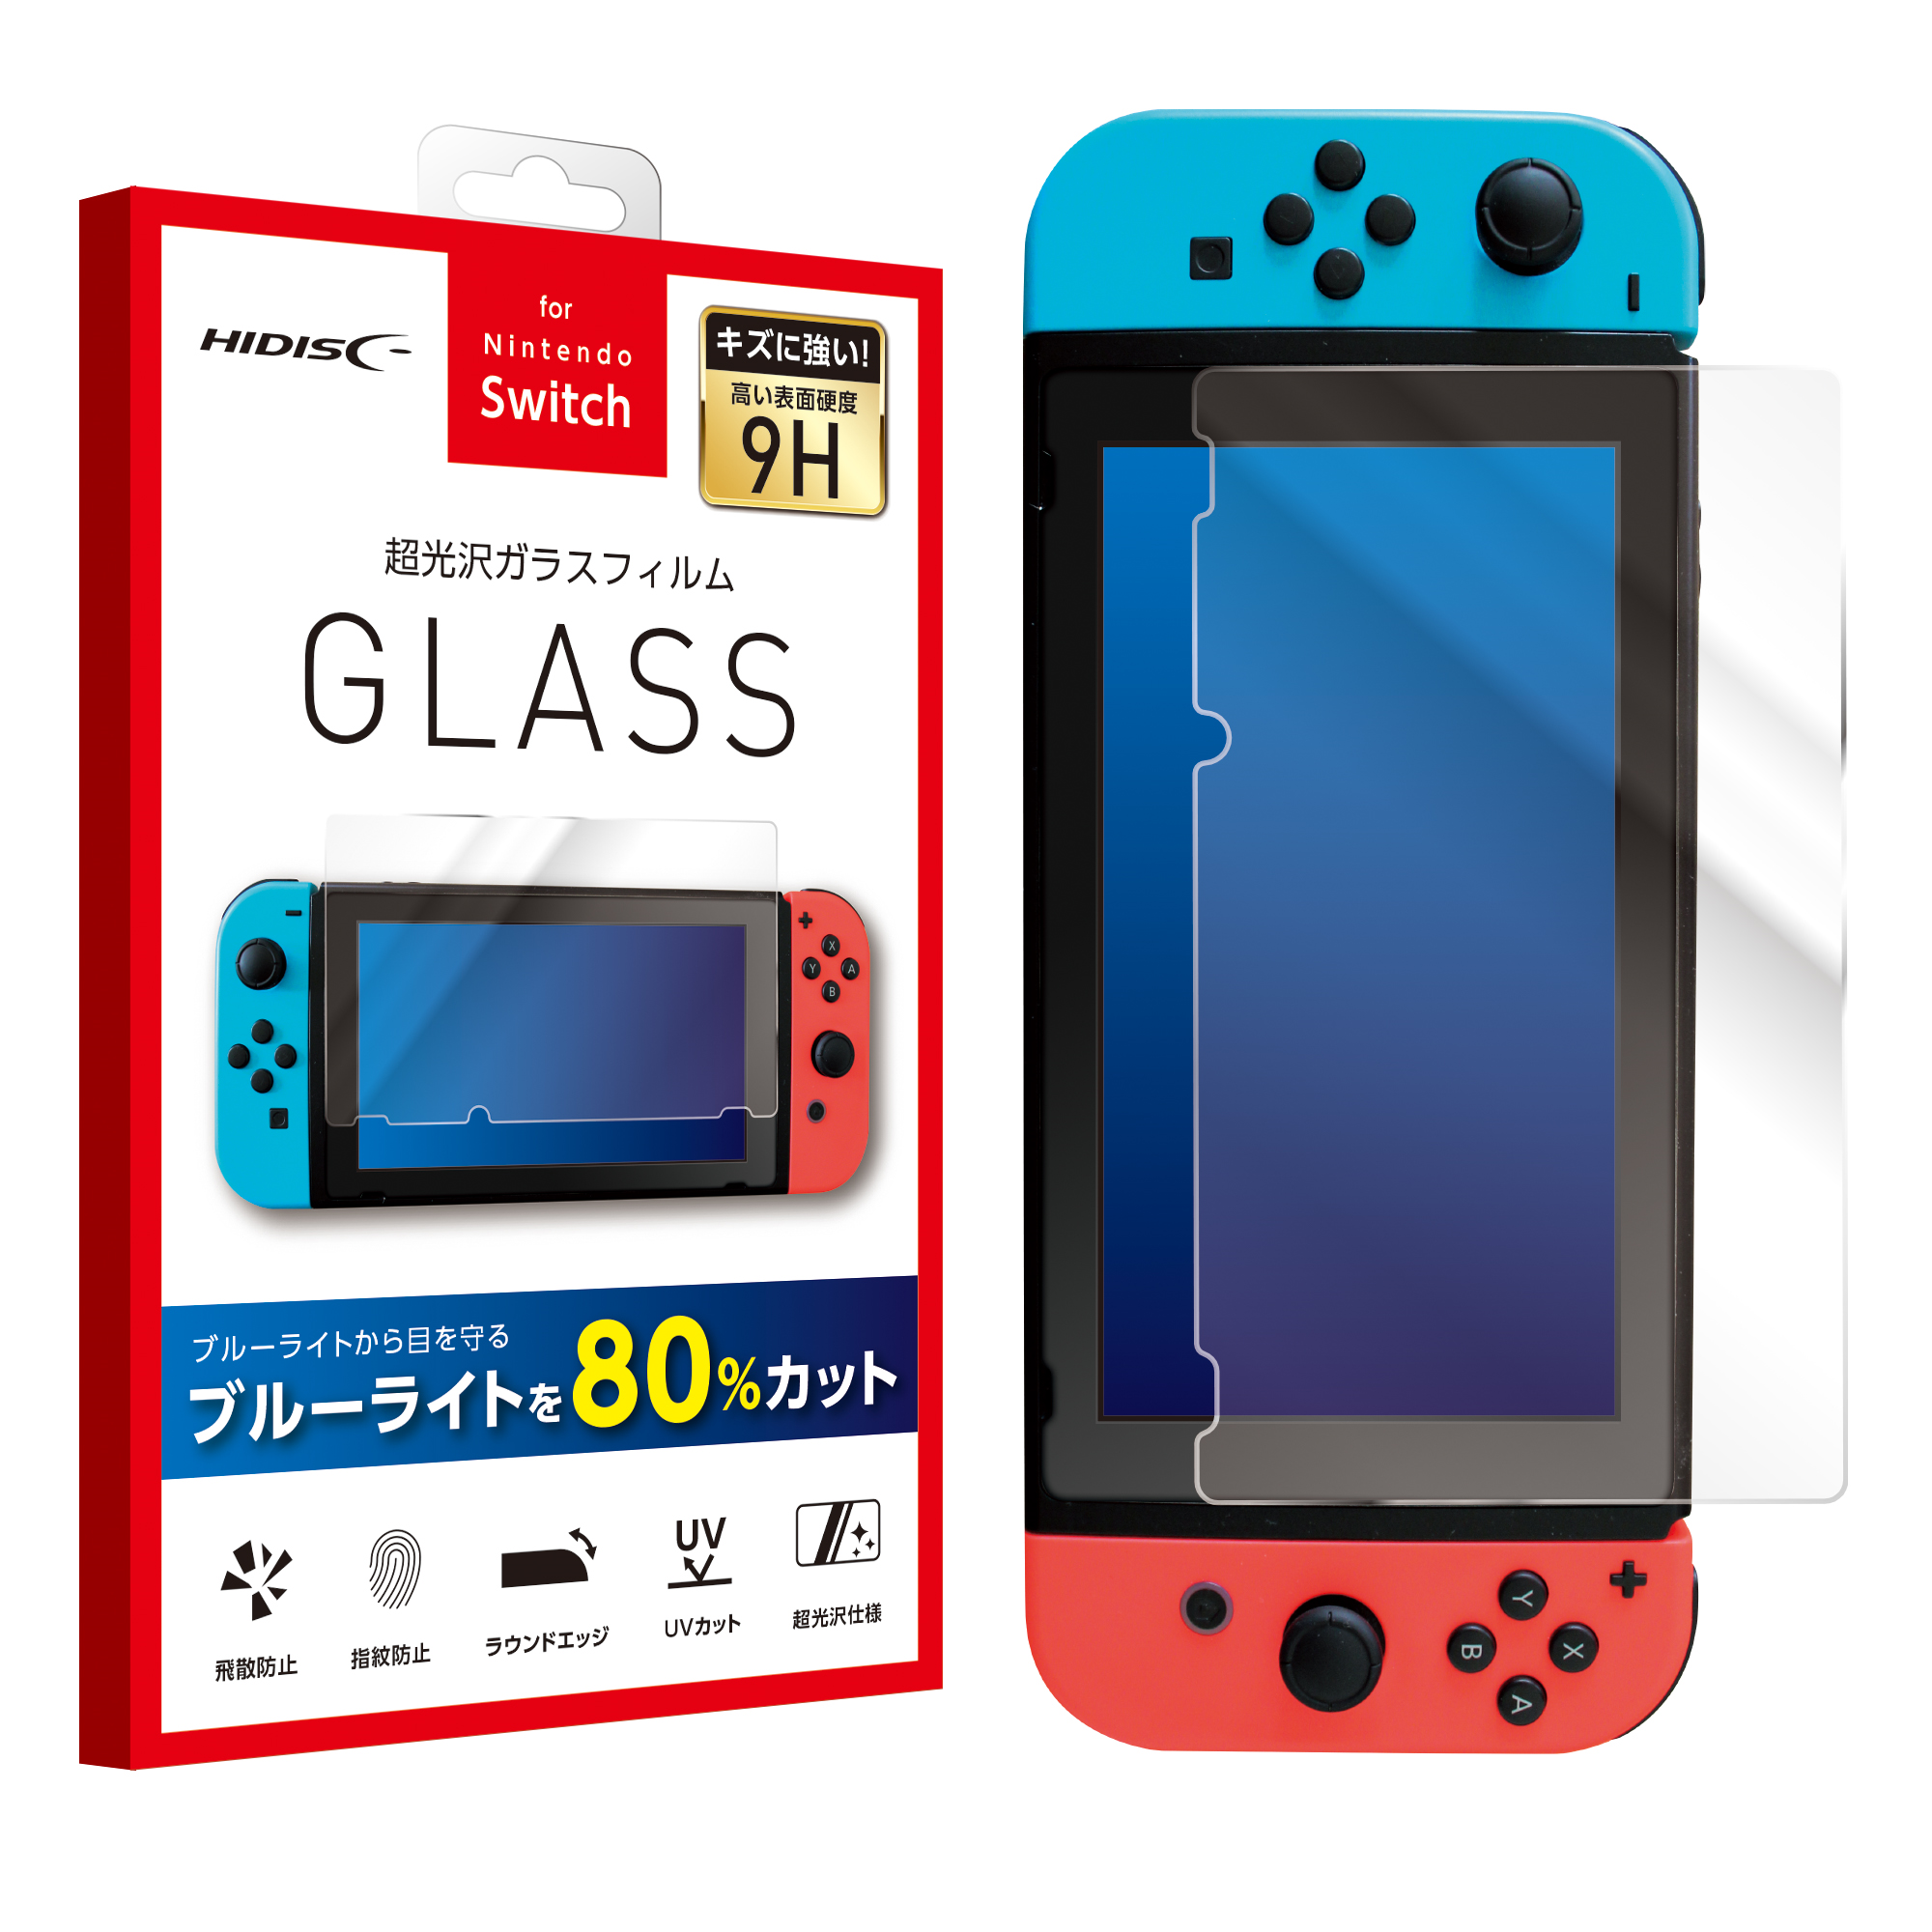 HIDISC 2.5D強化保護ガラスフィルム for Nintendo Switch  ブルーライトカット機能付き